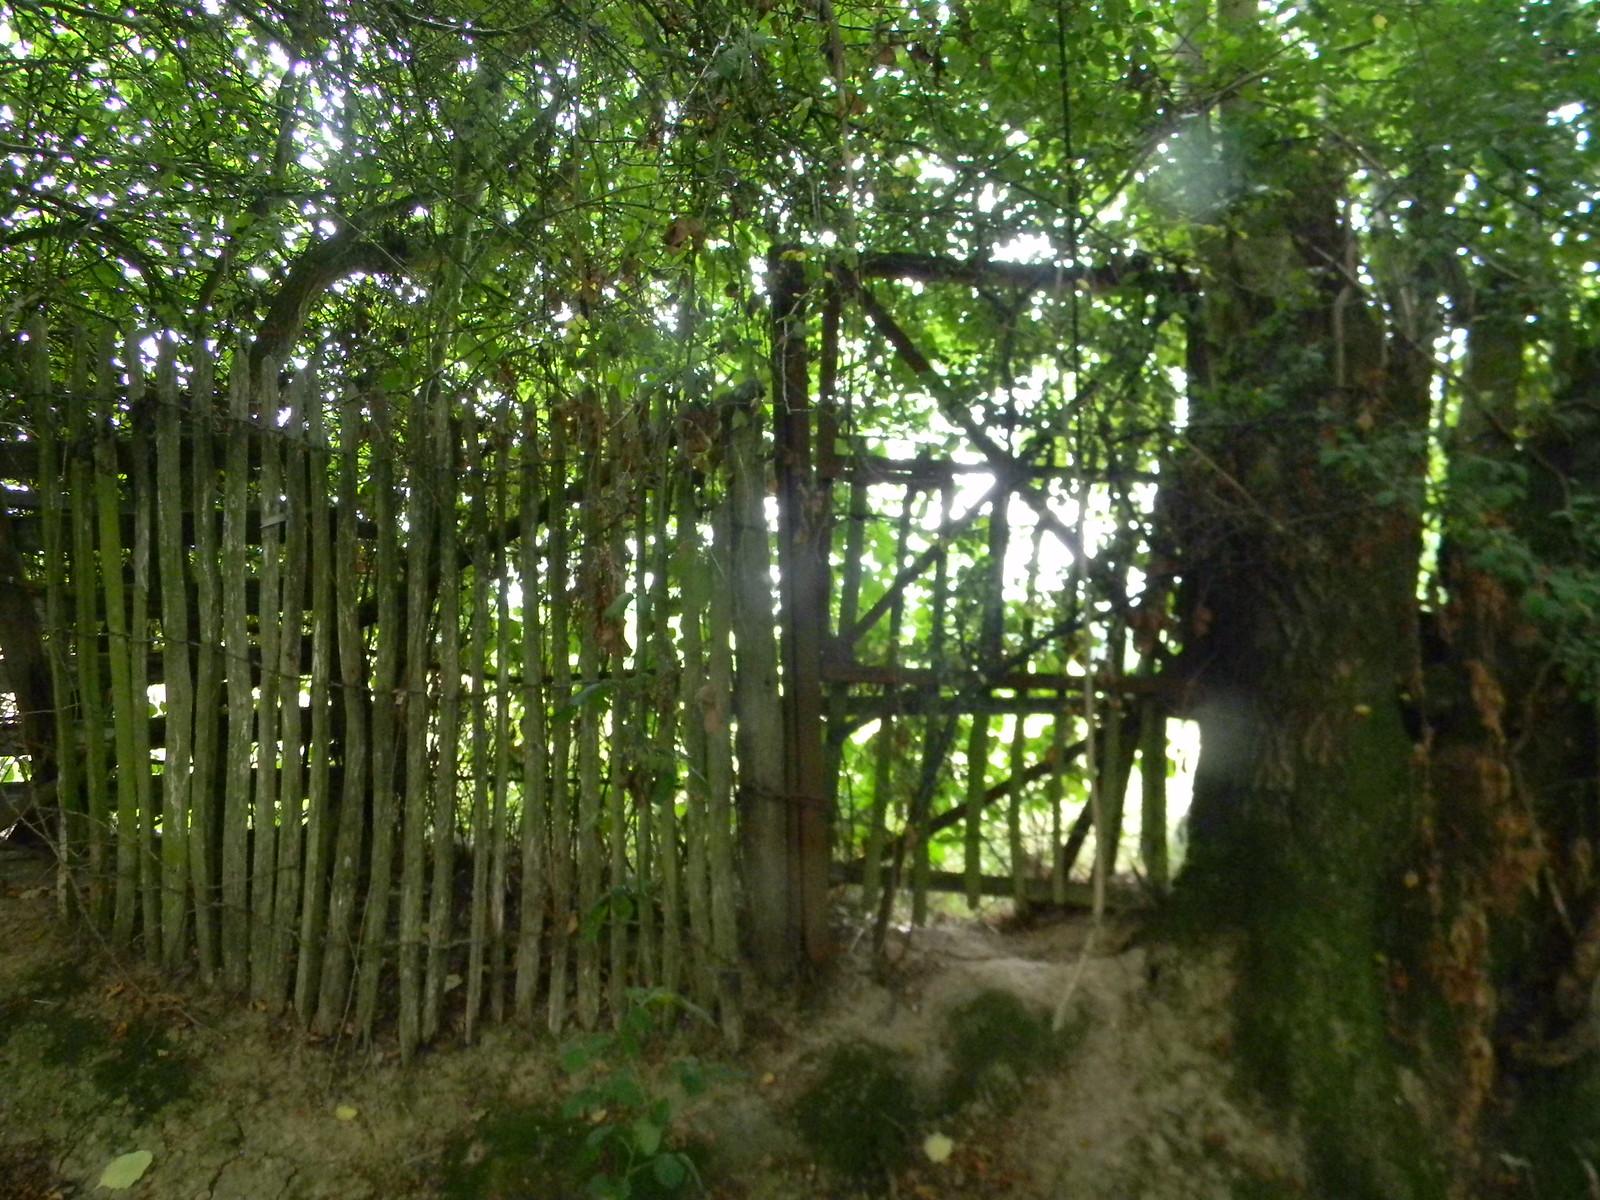 Ramshackle fence 4 Wadhurst Circular